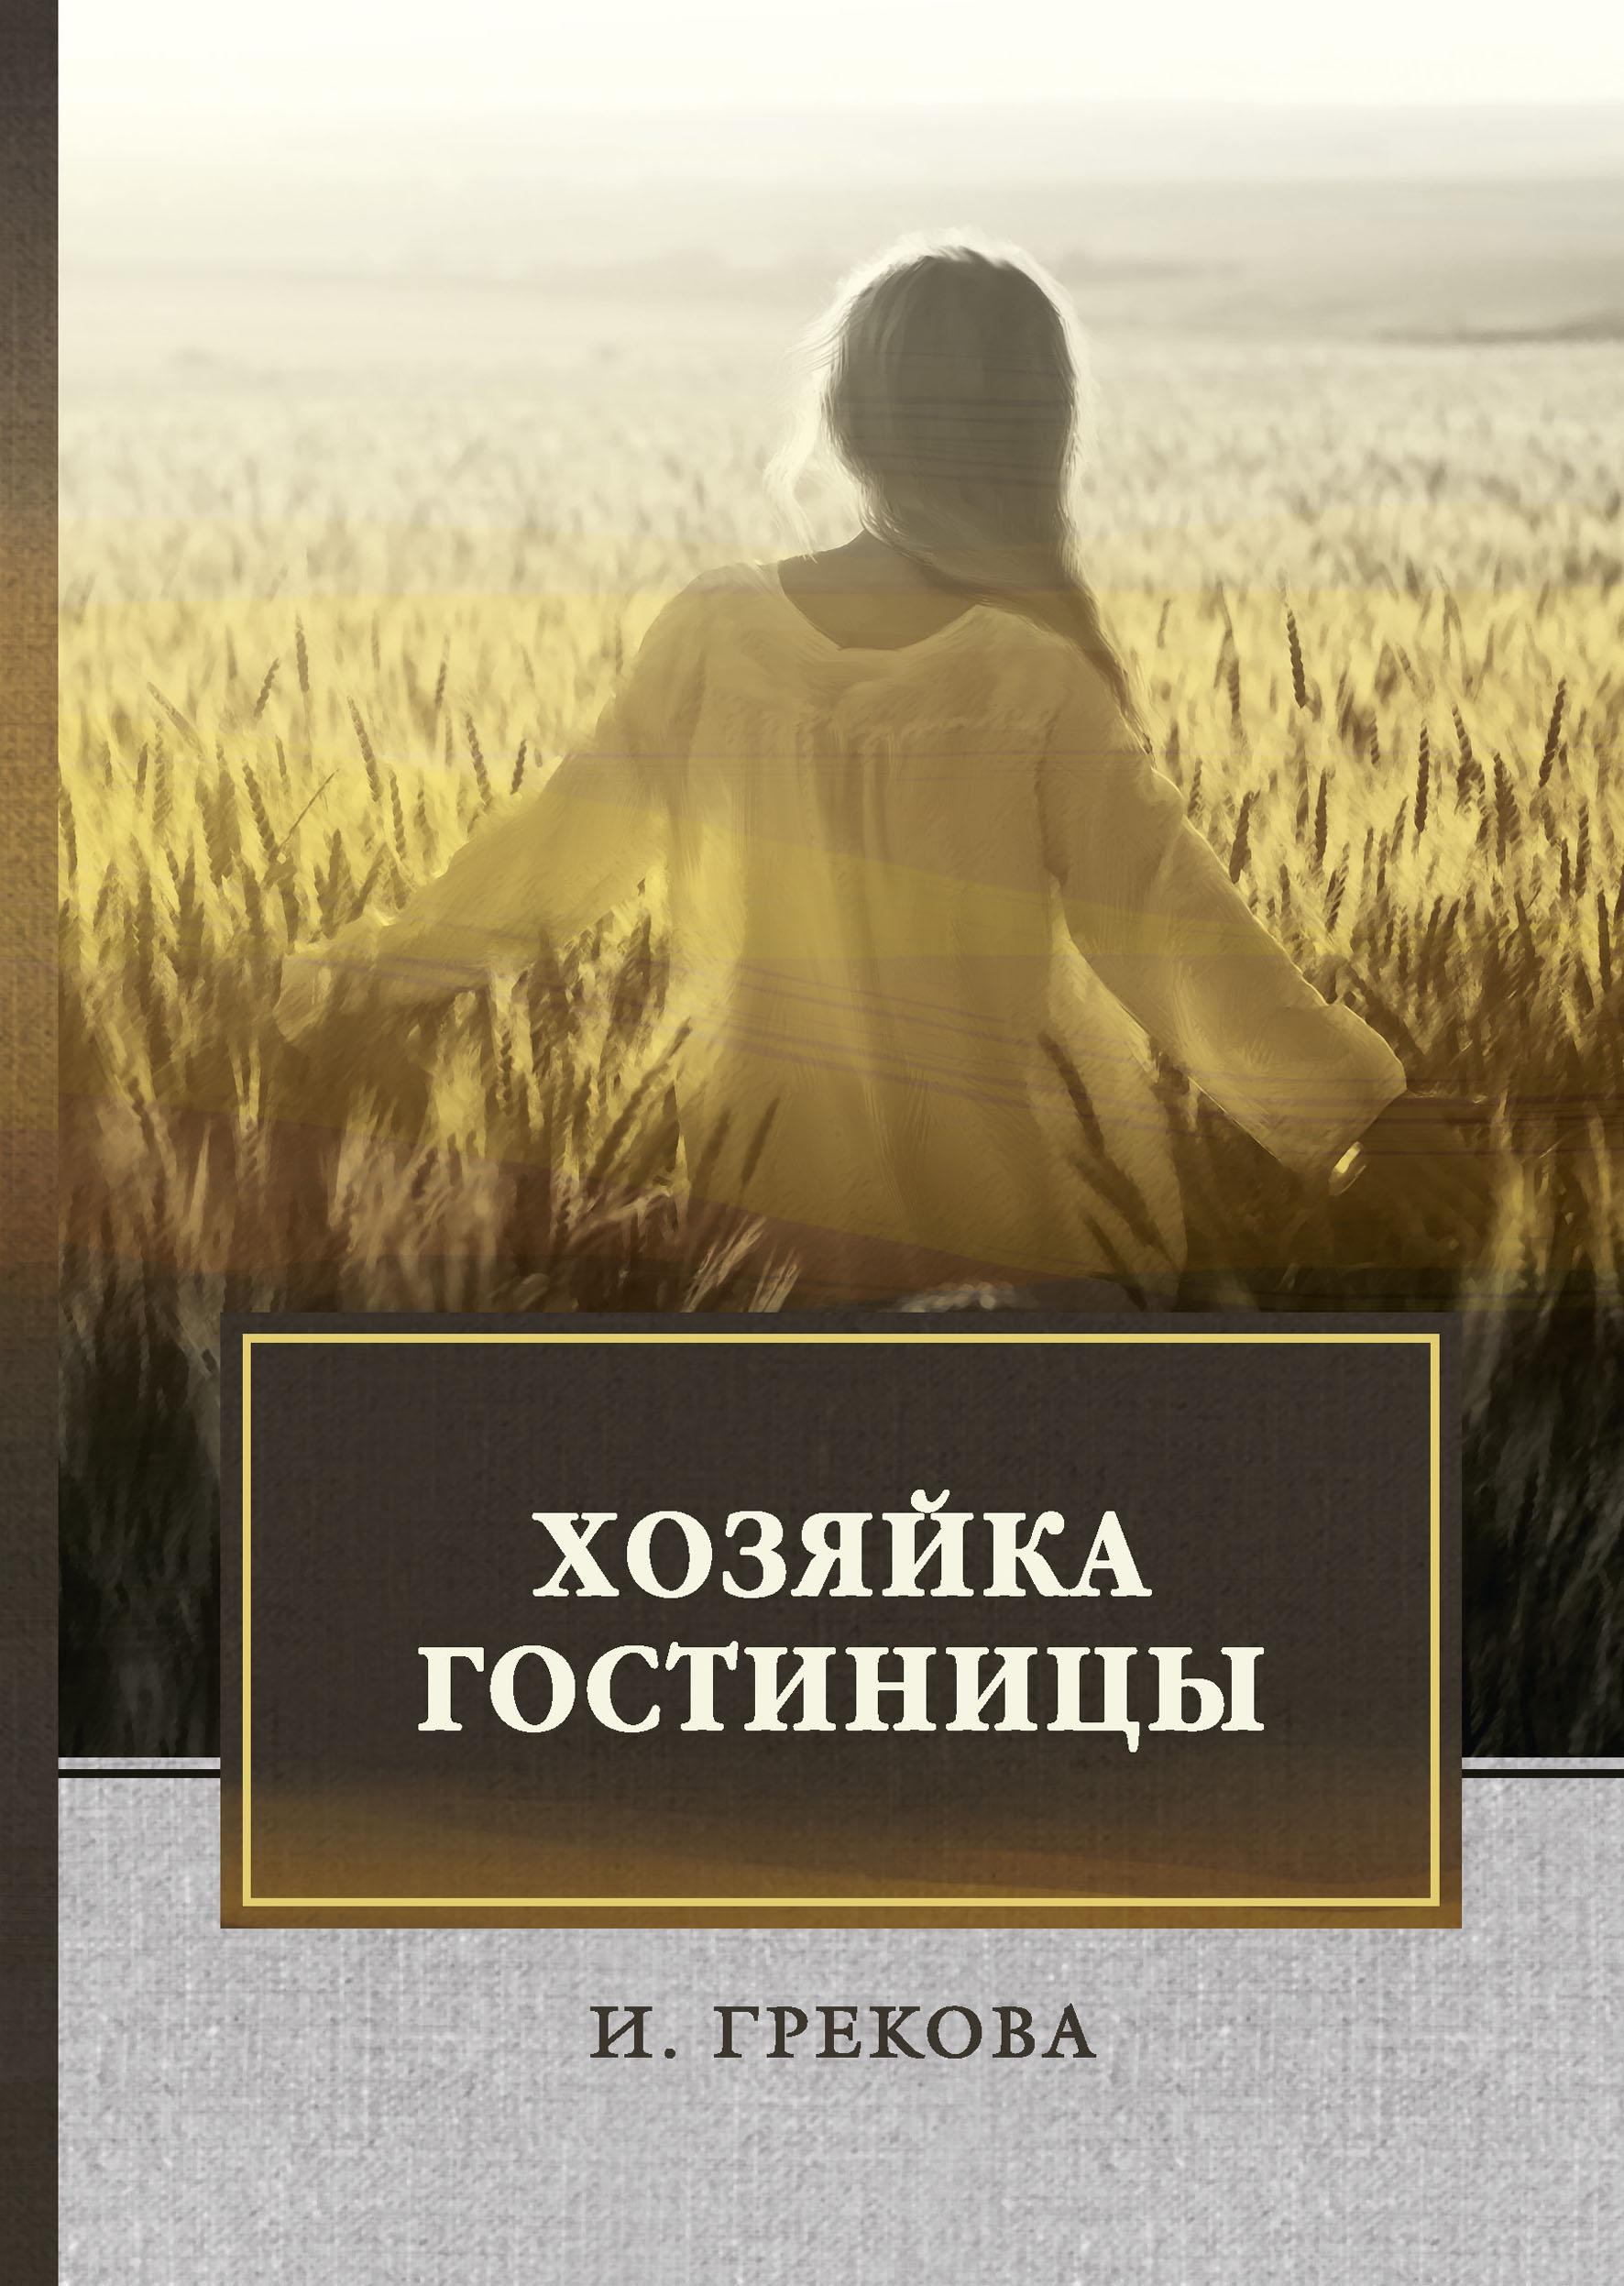 И. Грекова Хозяйка гостиницы